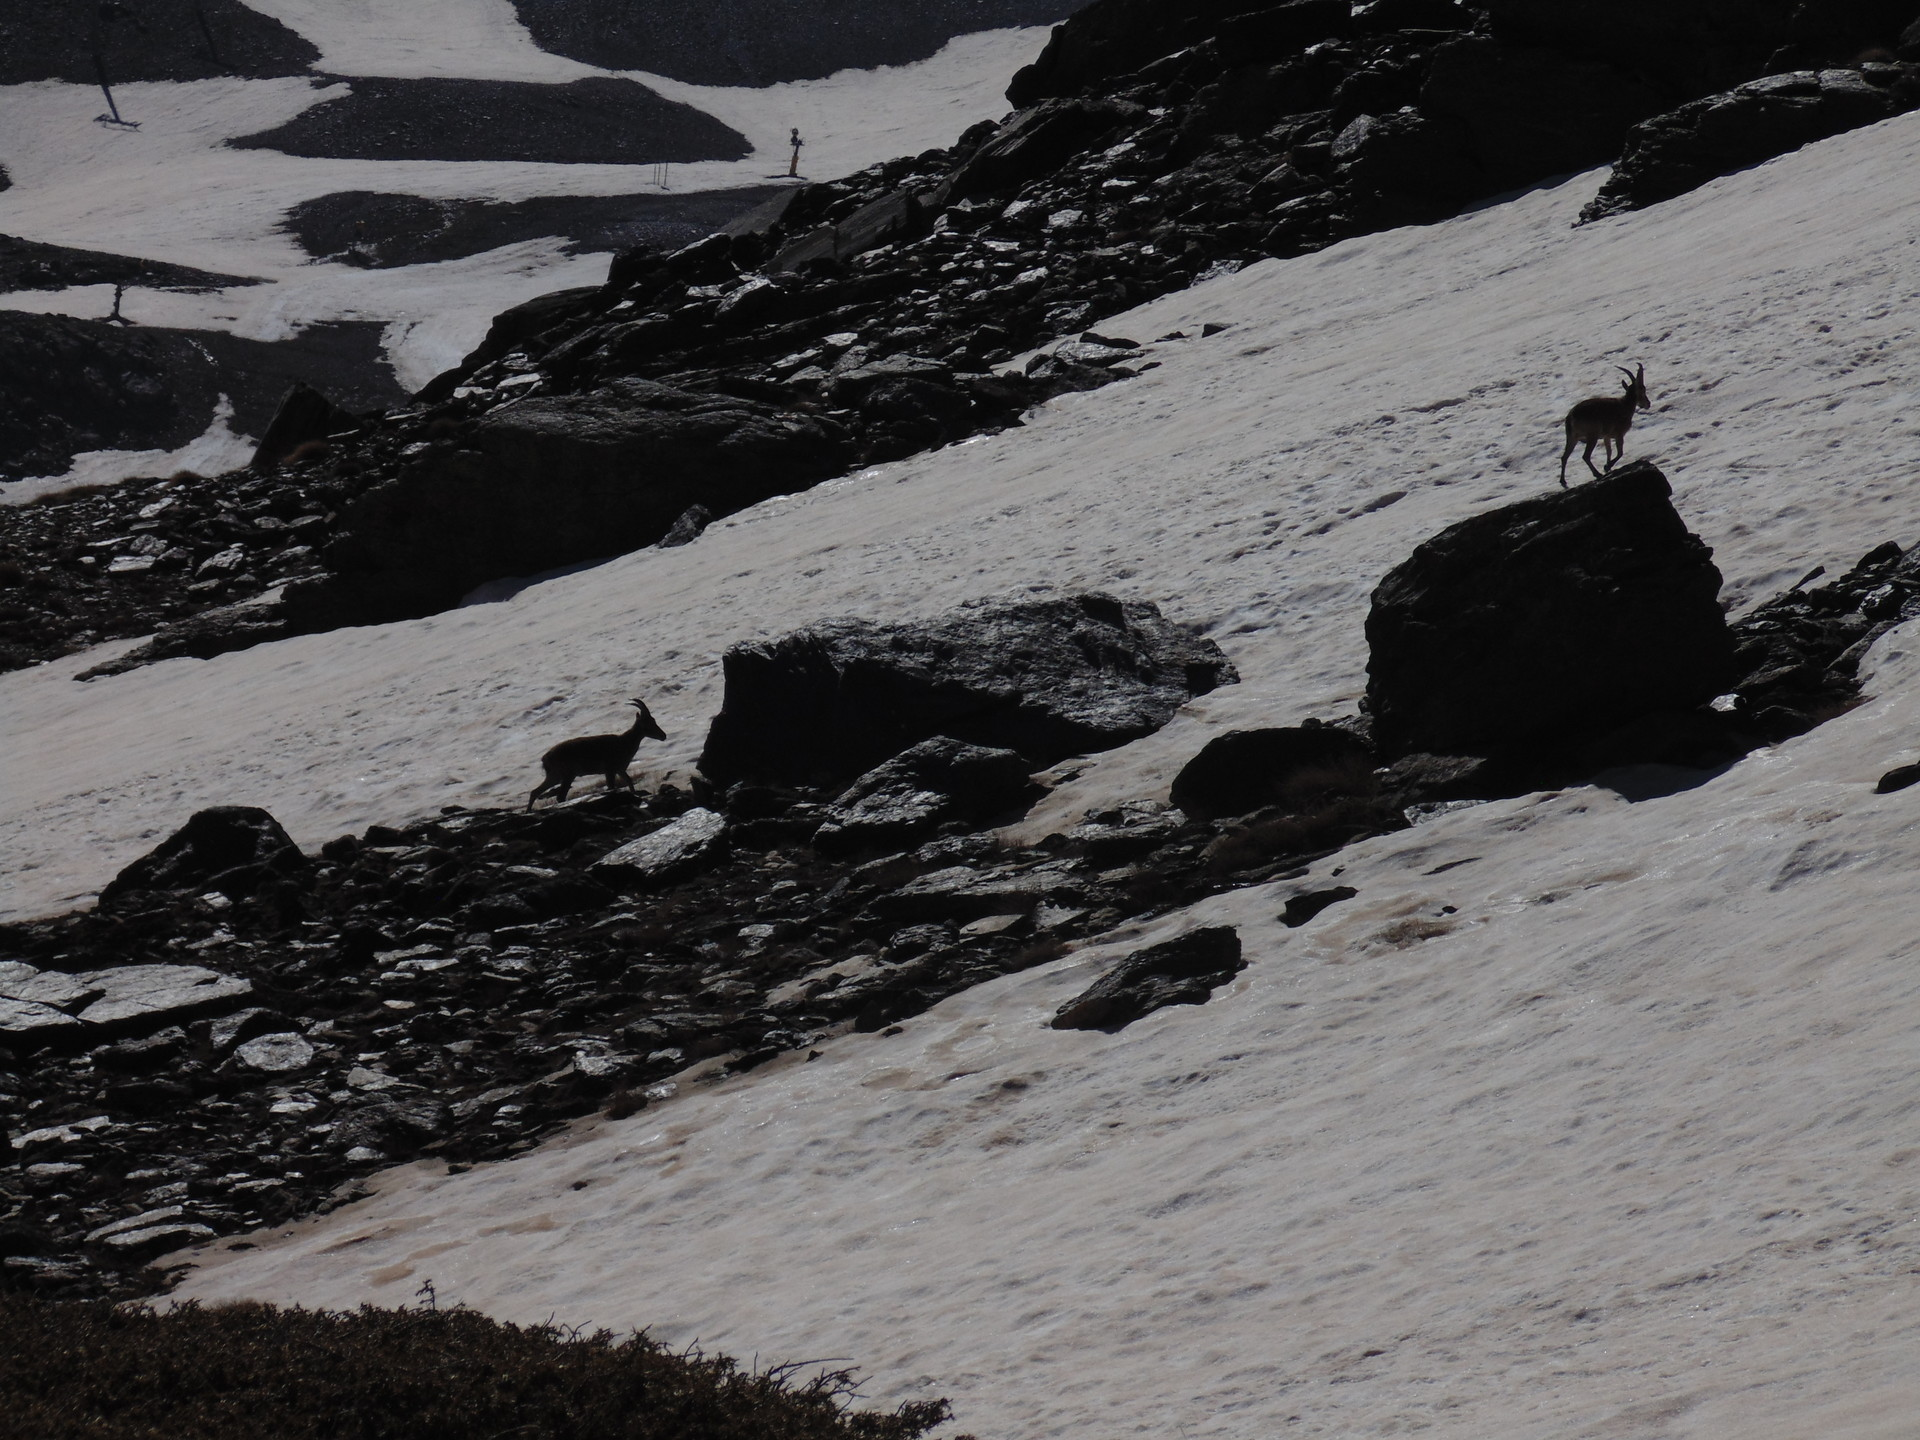 la-faune-de-sierra-nevada-c21ccaa9e5c872